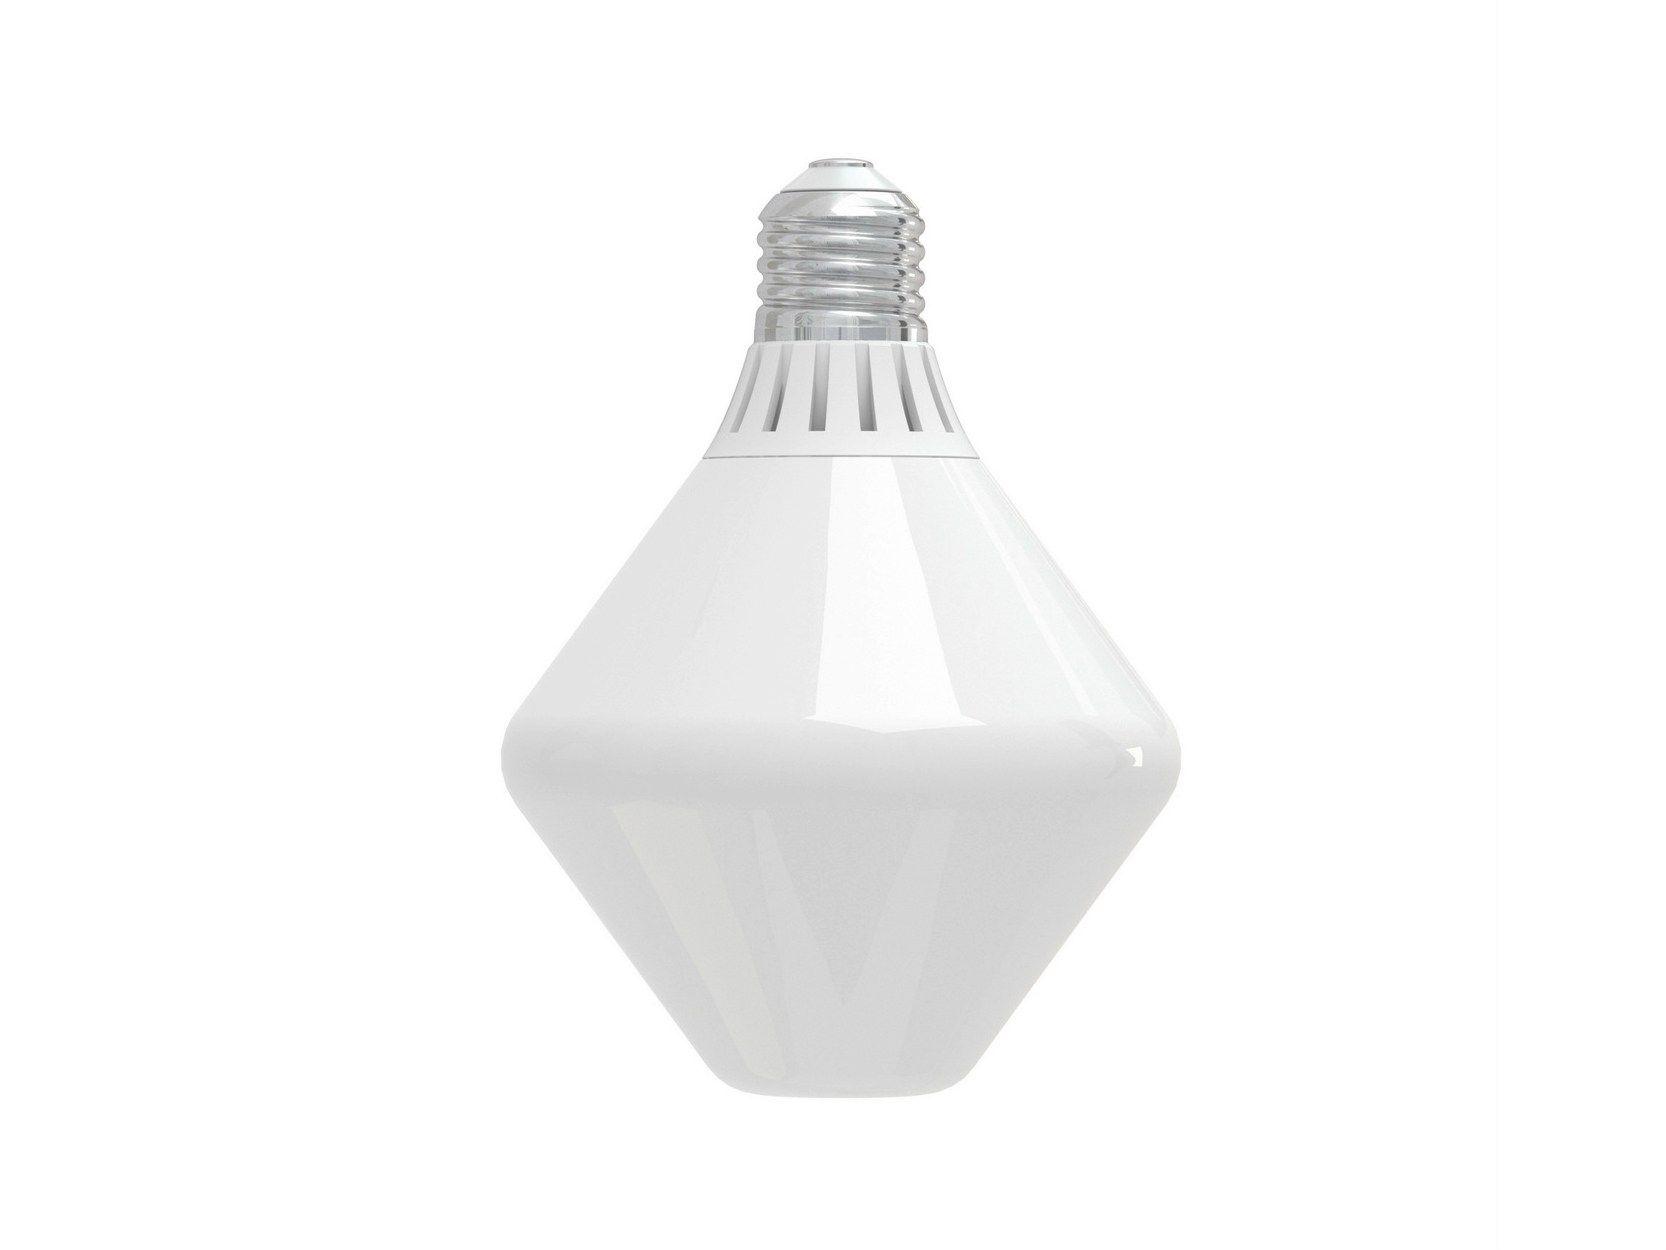 Artek products lighting pendant light a338 - Artek Products Lighting Pendant Light A338 50